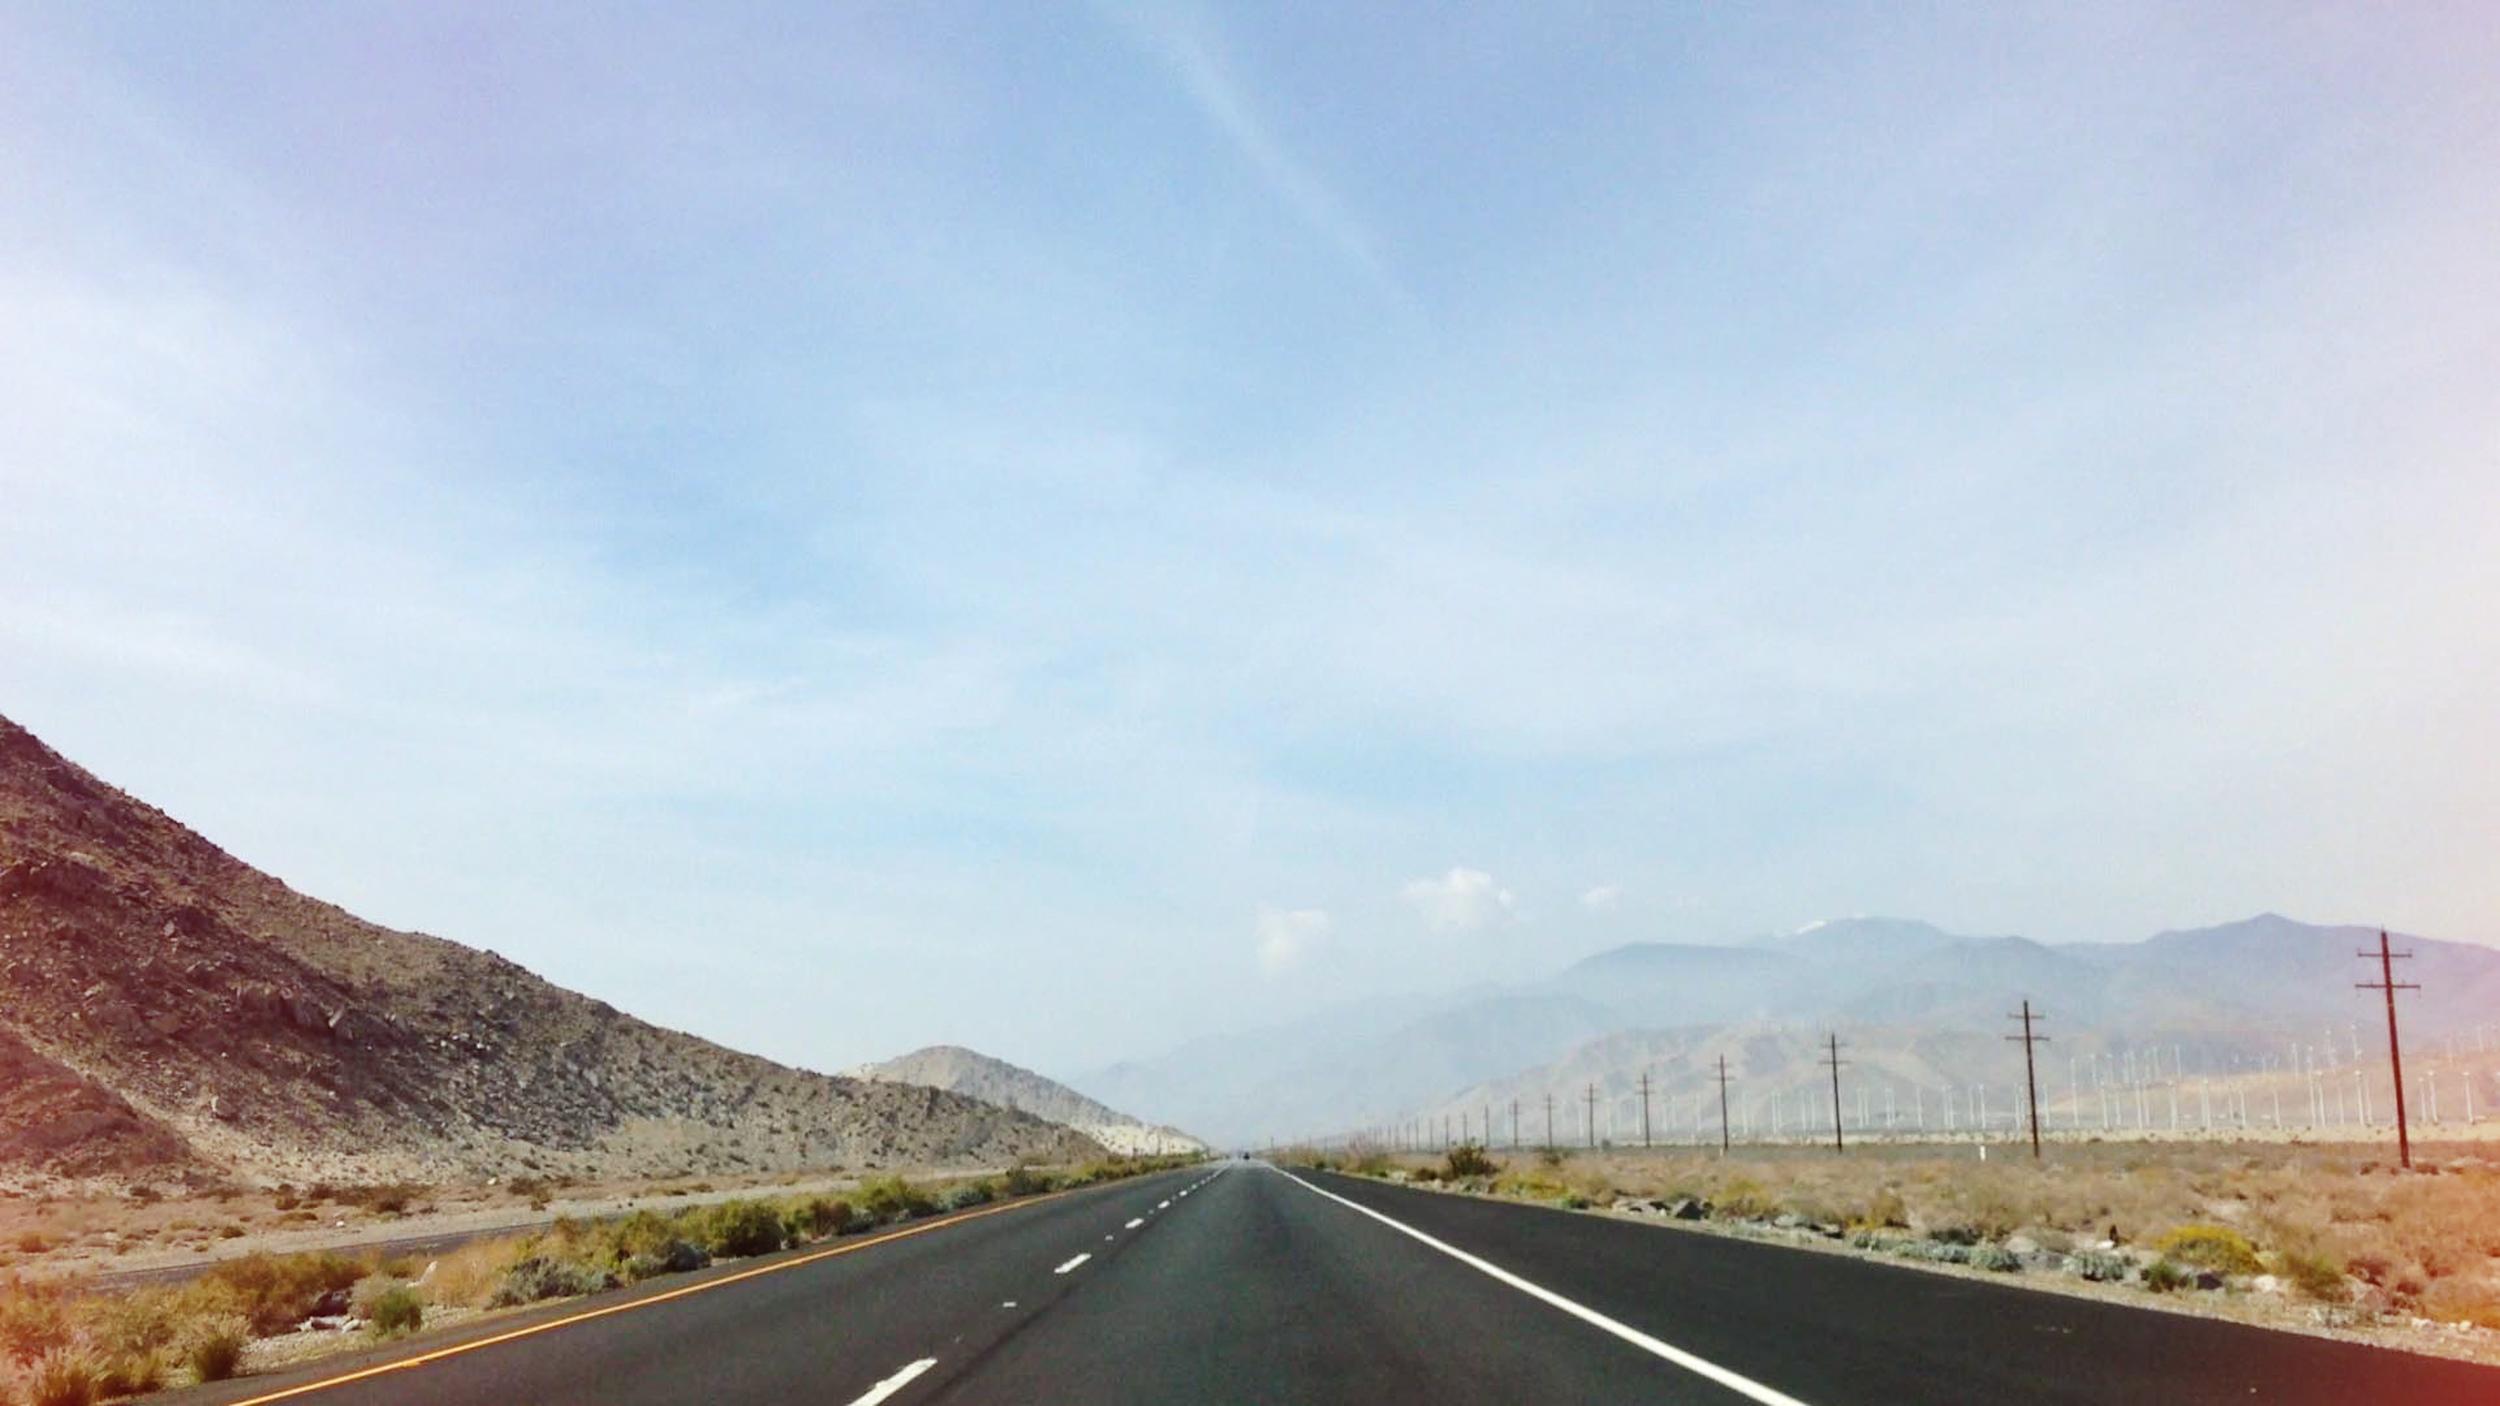 Naomi Yamada - Palm Springs Highway